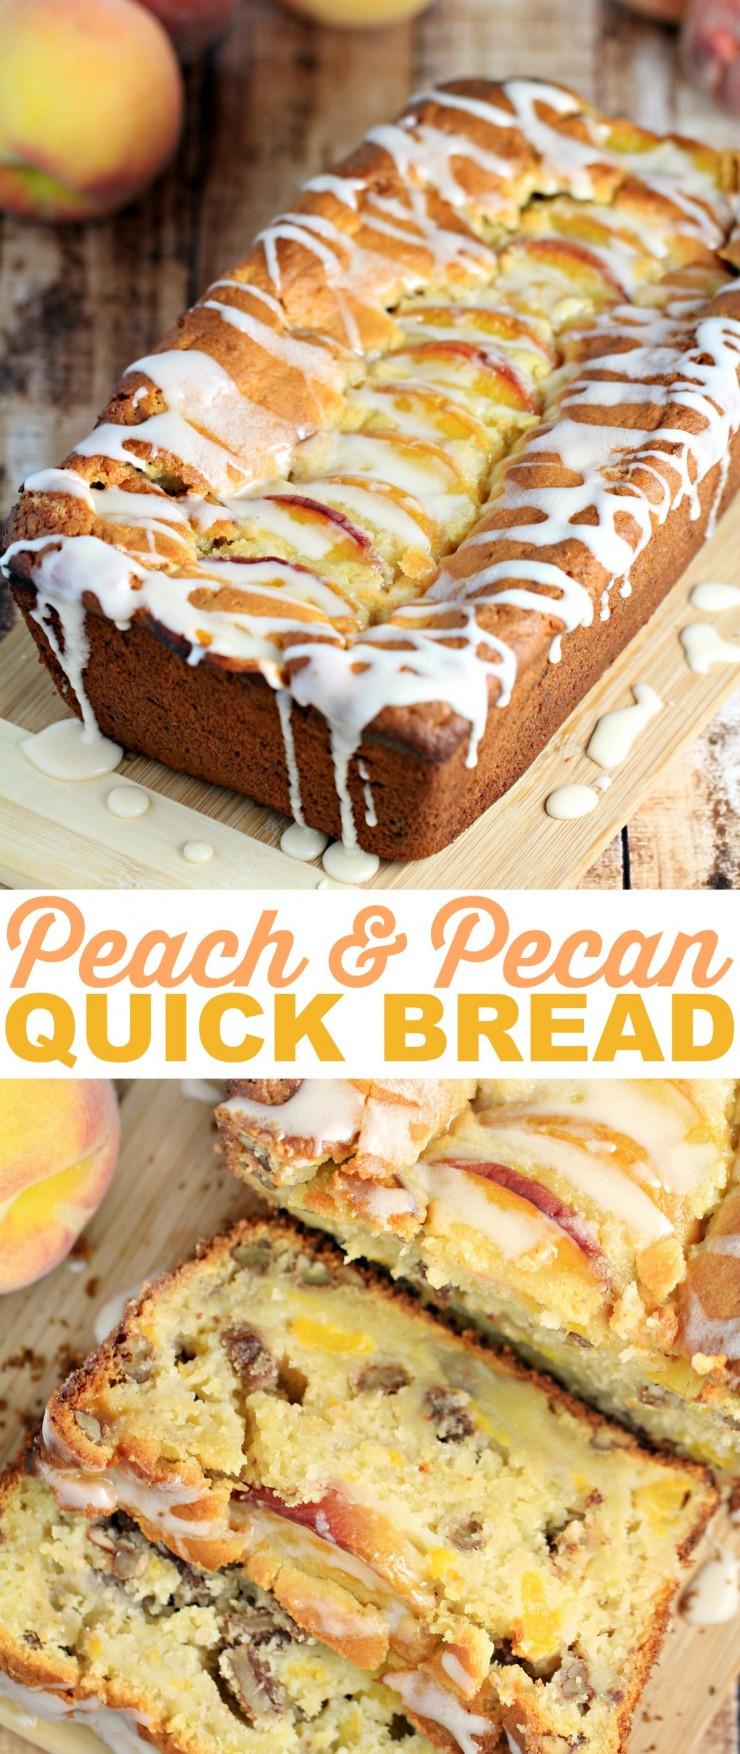 Quick Bread Recipes  Pecan & Peach Quick Bread Life Love Liz